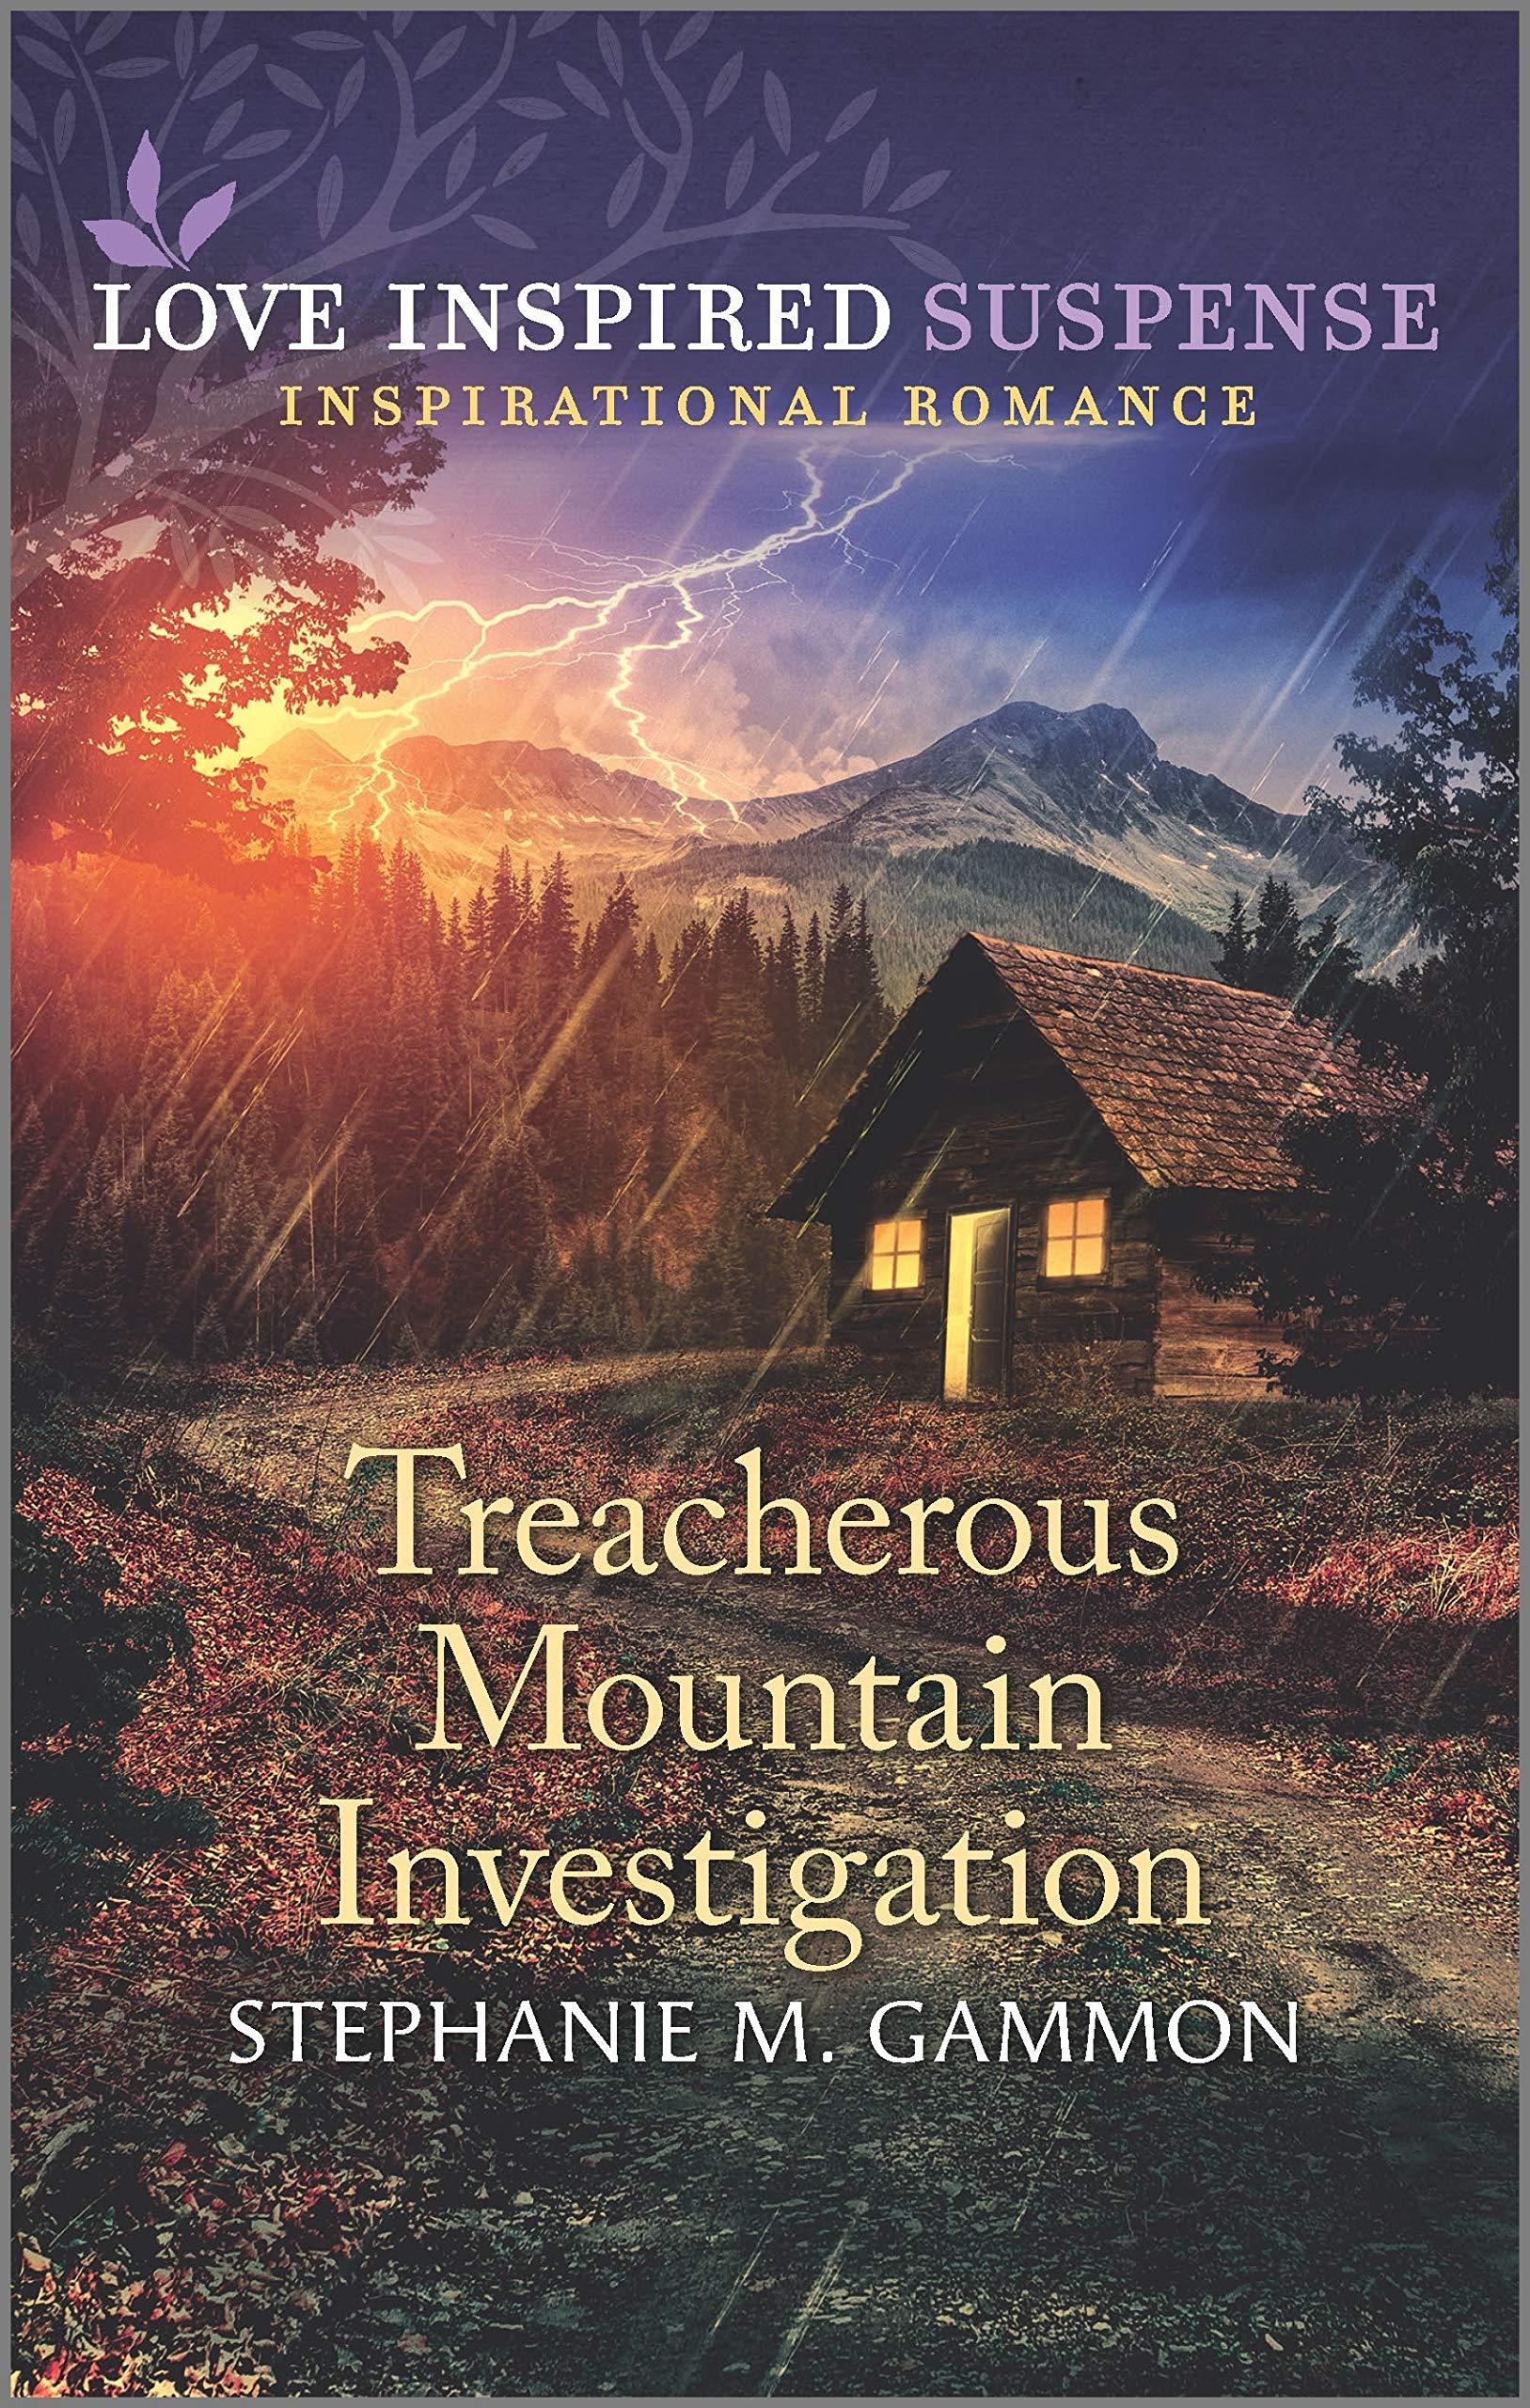 Treacherous Mountain Investigation (Love Inspired Suspense)